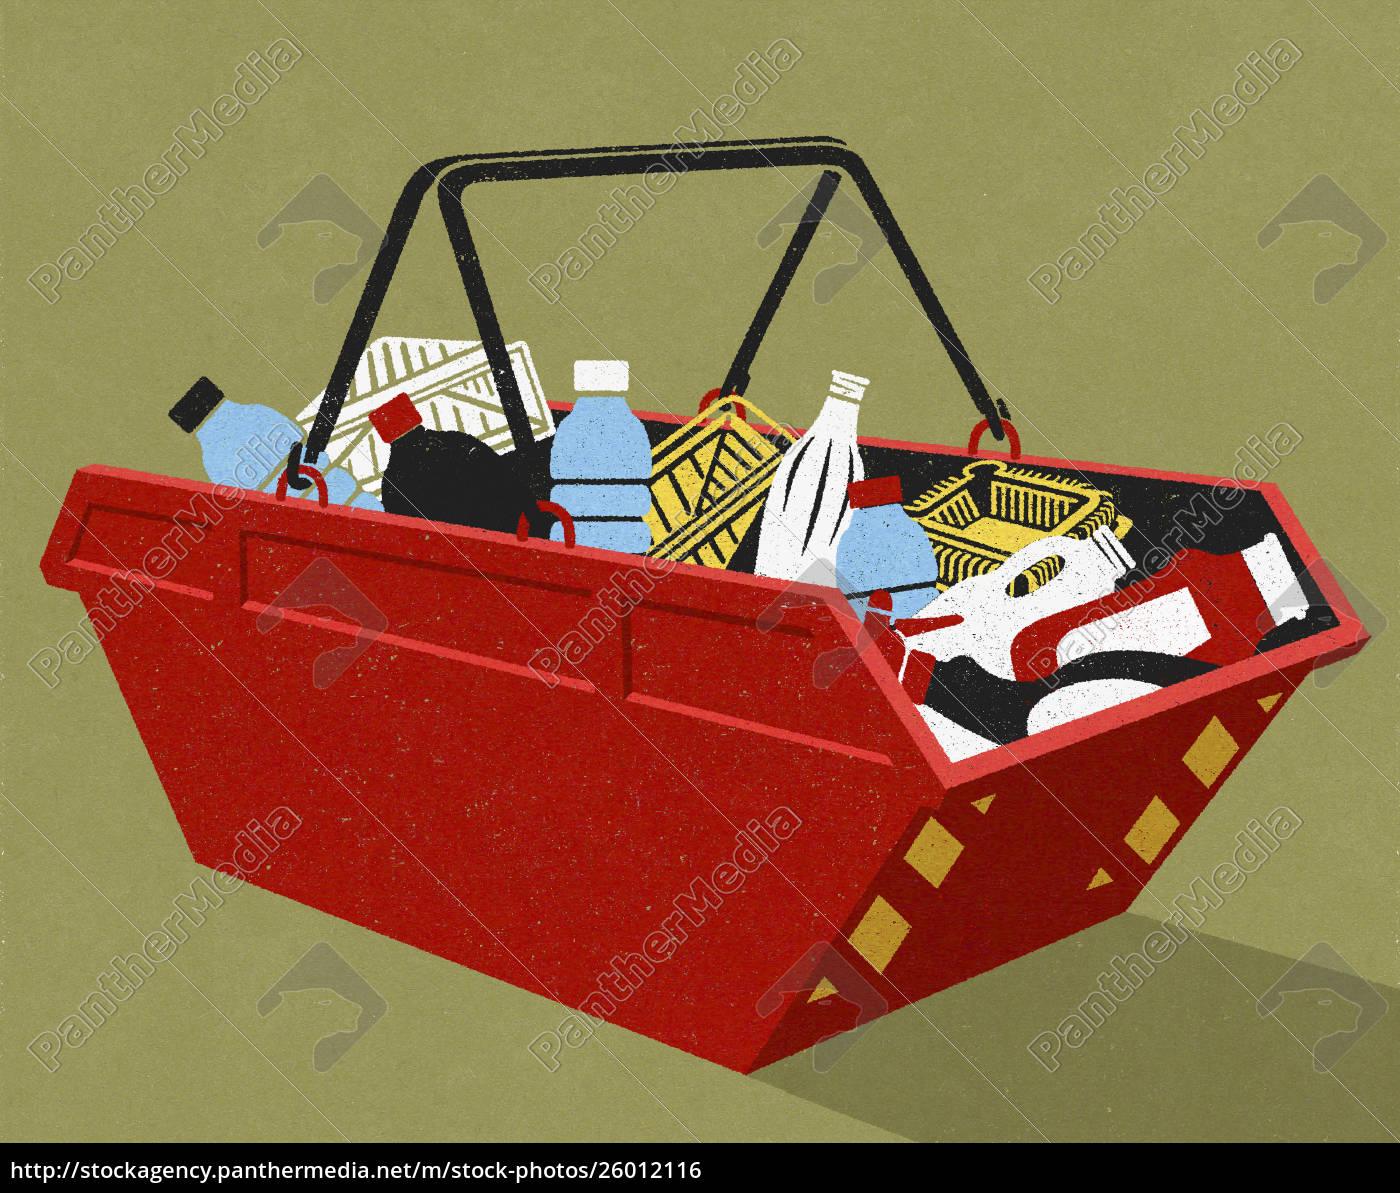 kunststoffverpackungsrecycling, im, industriekorb - 26012116